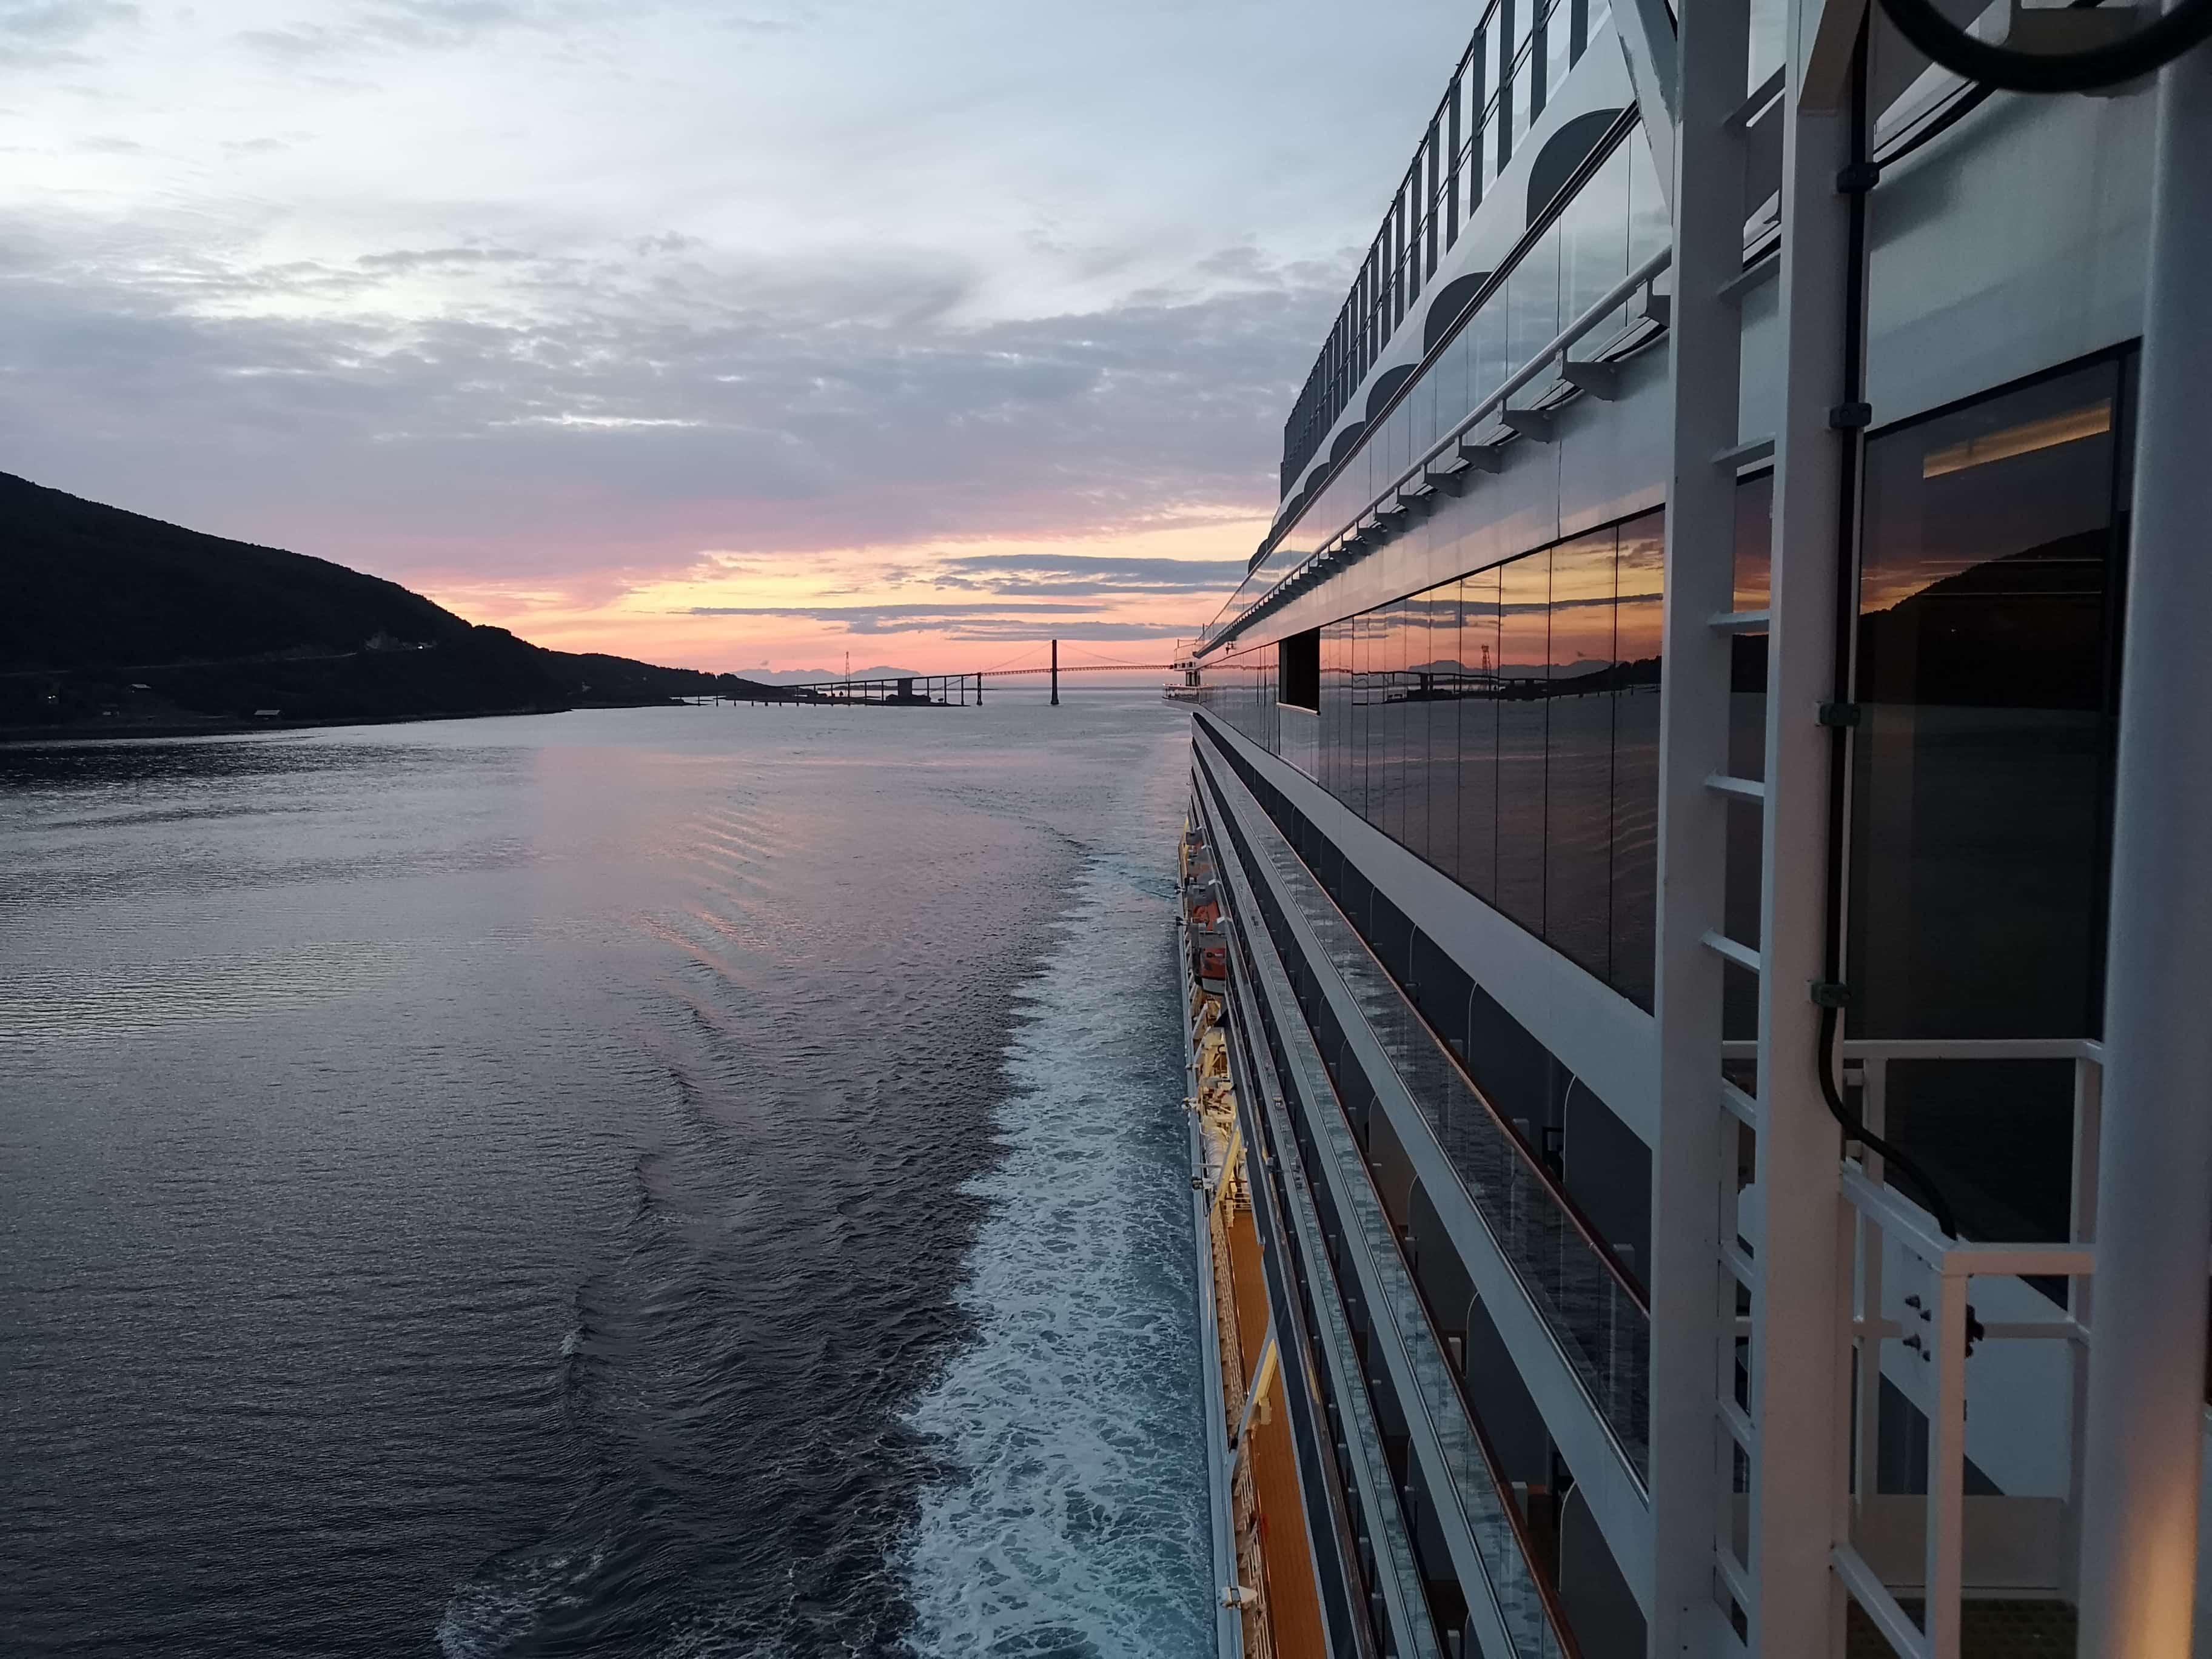 Viking Sea - Midnight Sun Norway Reflection of Sunset in windows of cruise ship